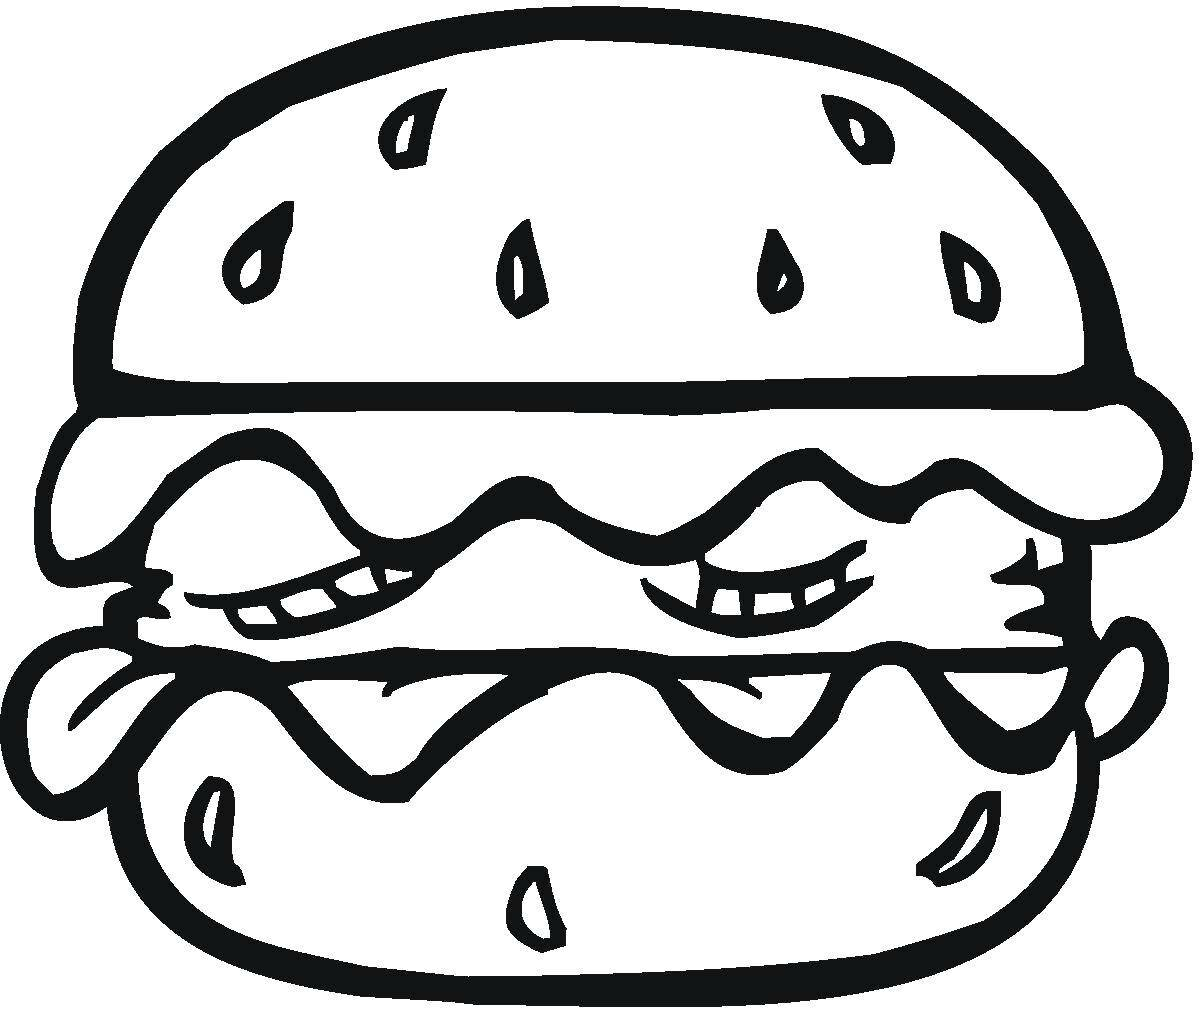 картинки гамбургера раскраска устинова